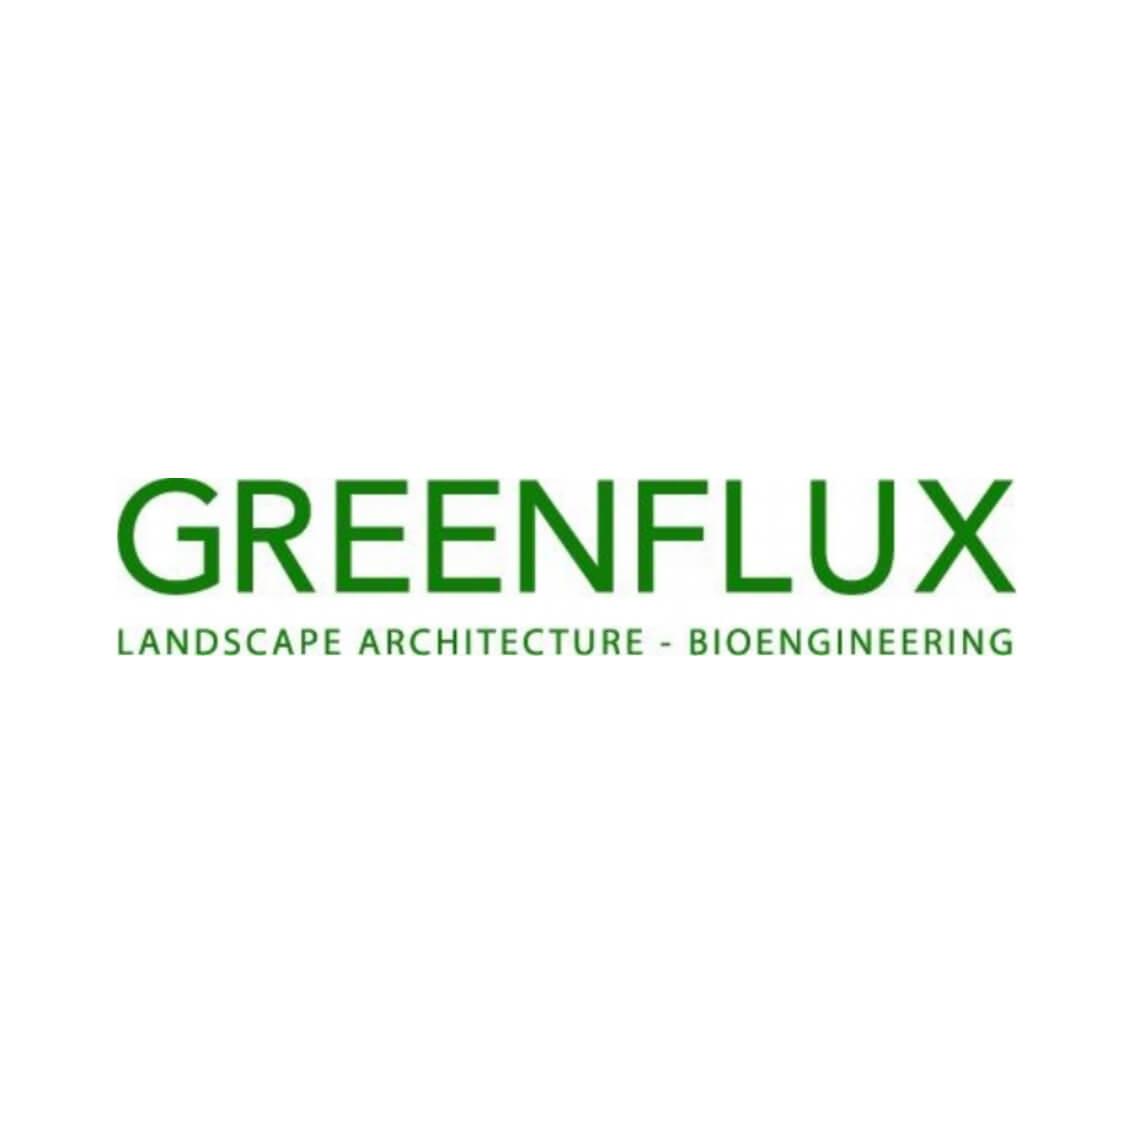 GREENFLUX Landscape Architecture